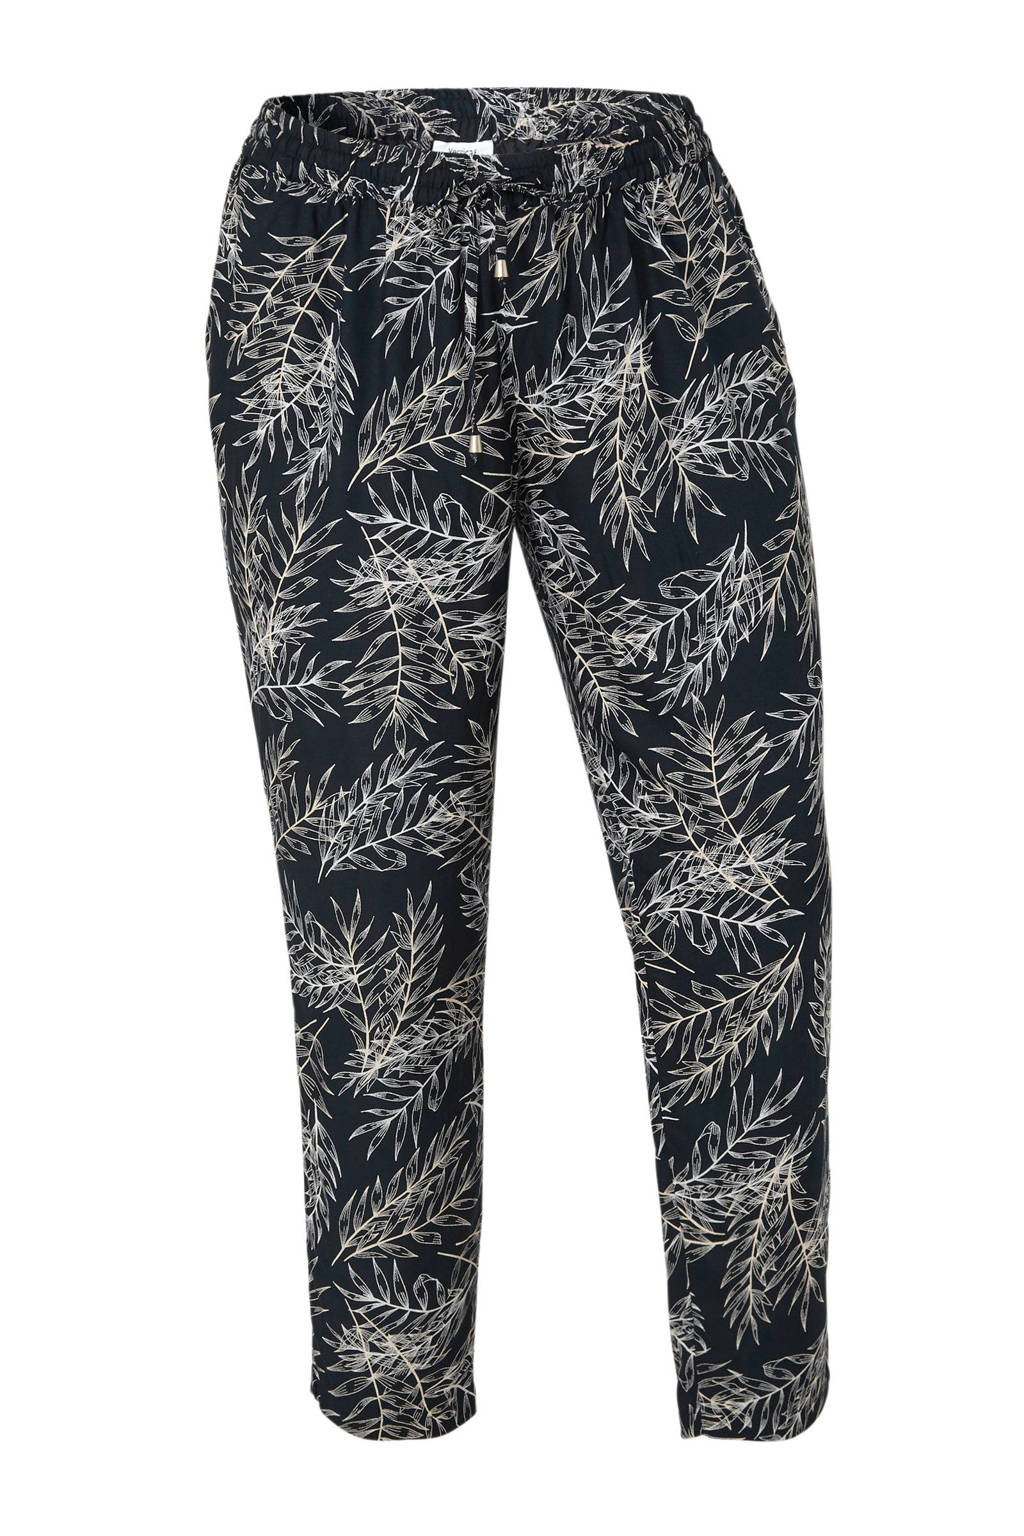 C&A XL Yessica tapered fit broek met bladprint marine, Marine